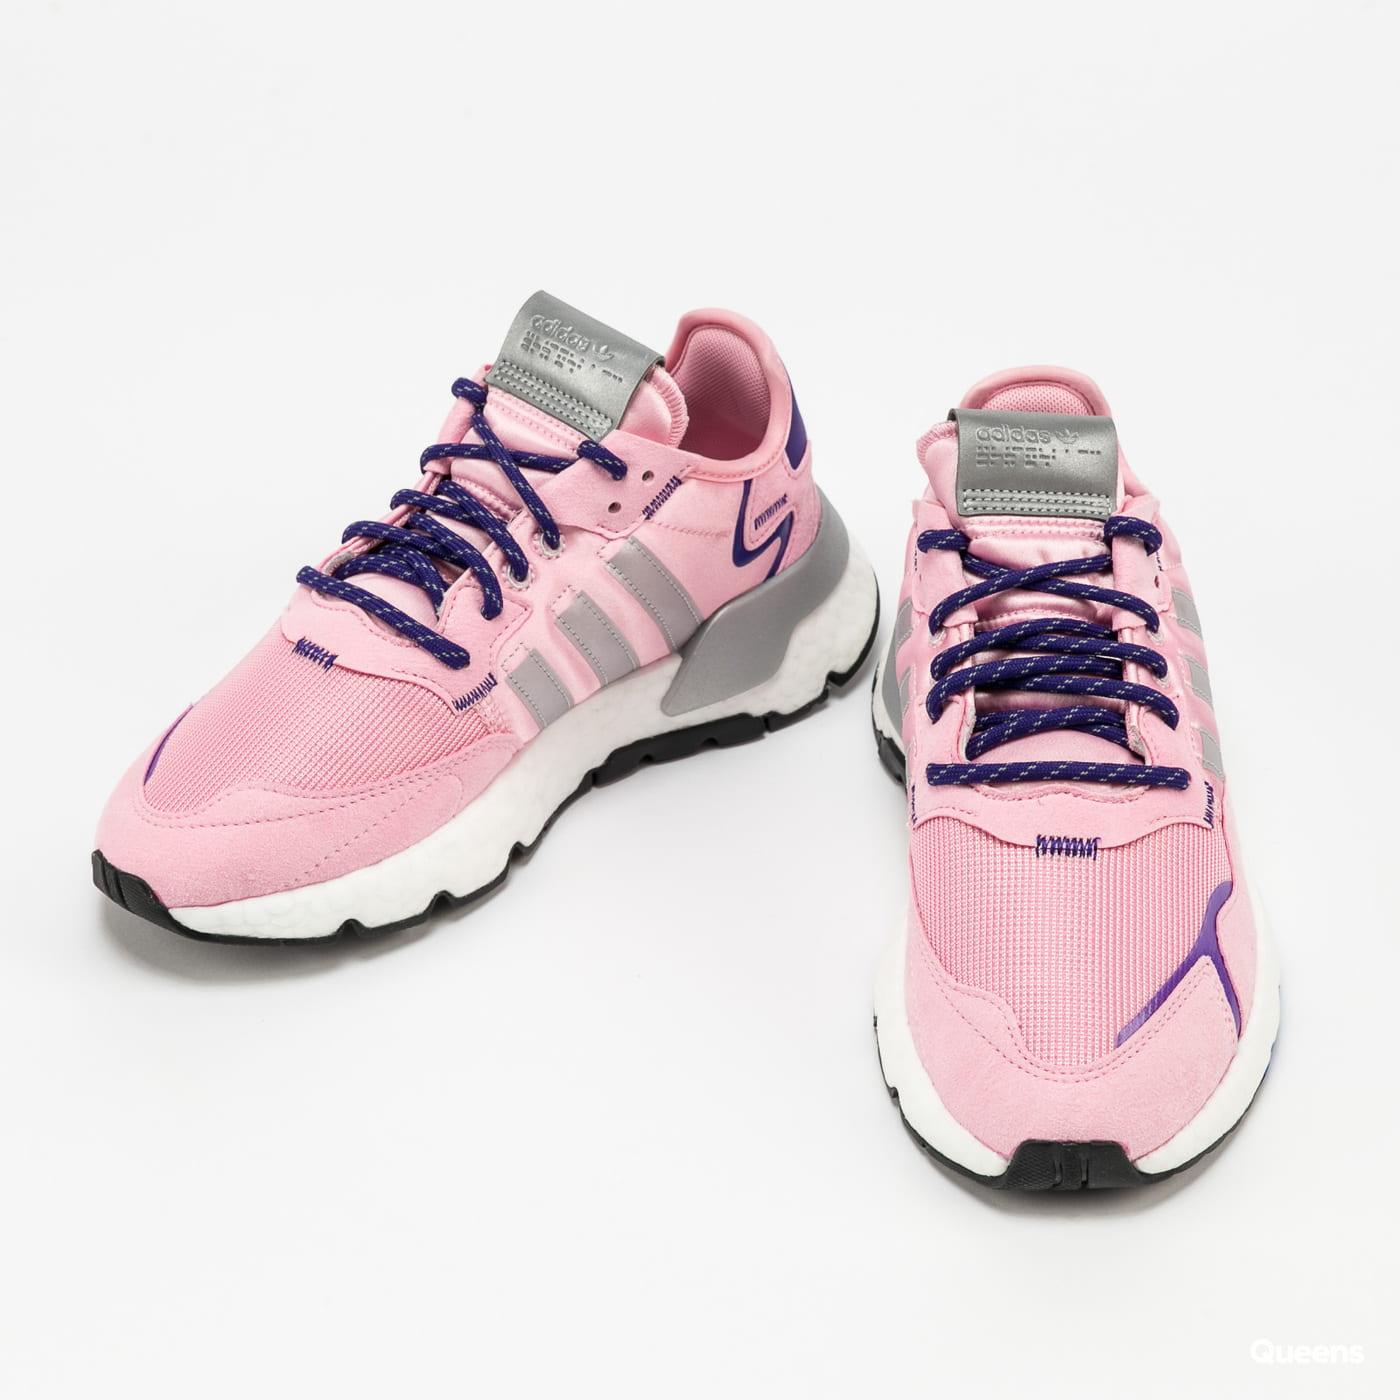 adidas Originals Nite Jogger W trupnk / silvmt / cpurpl